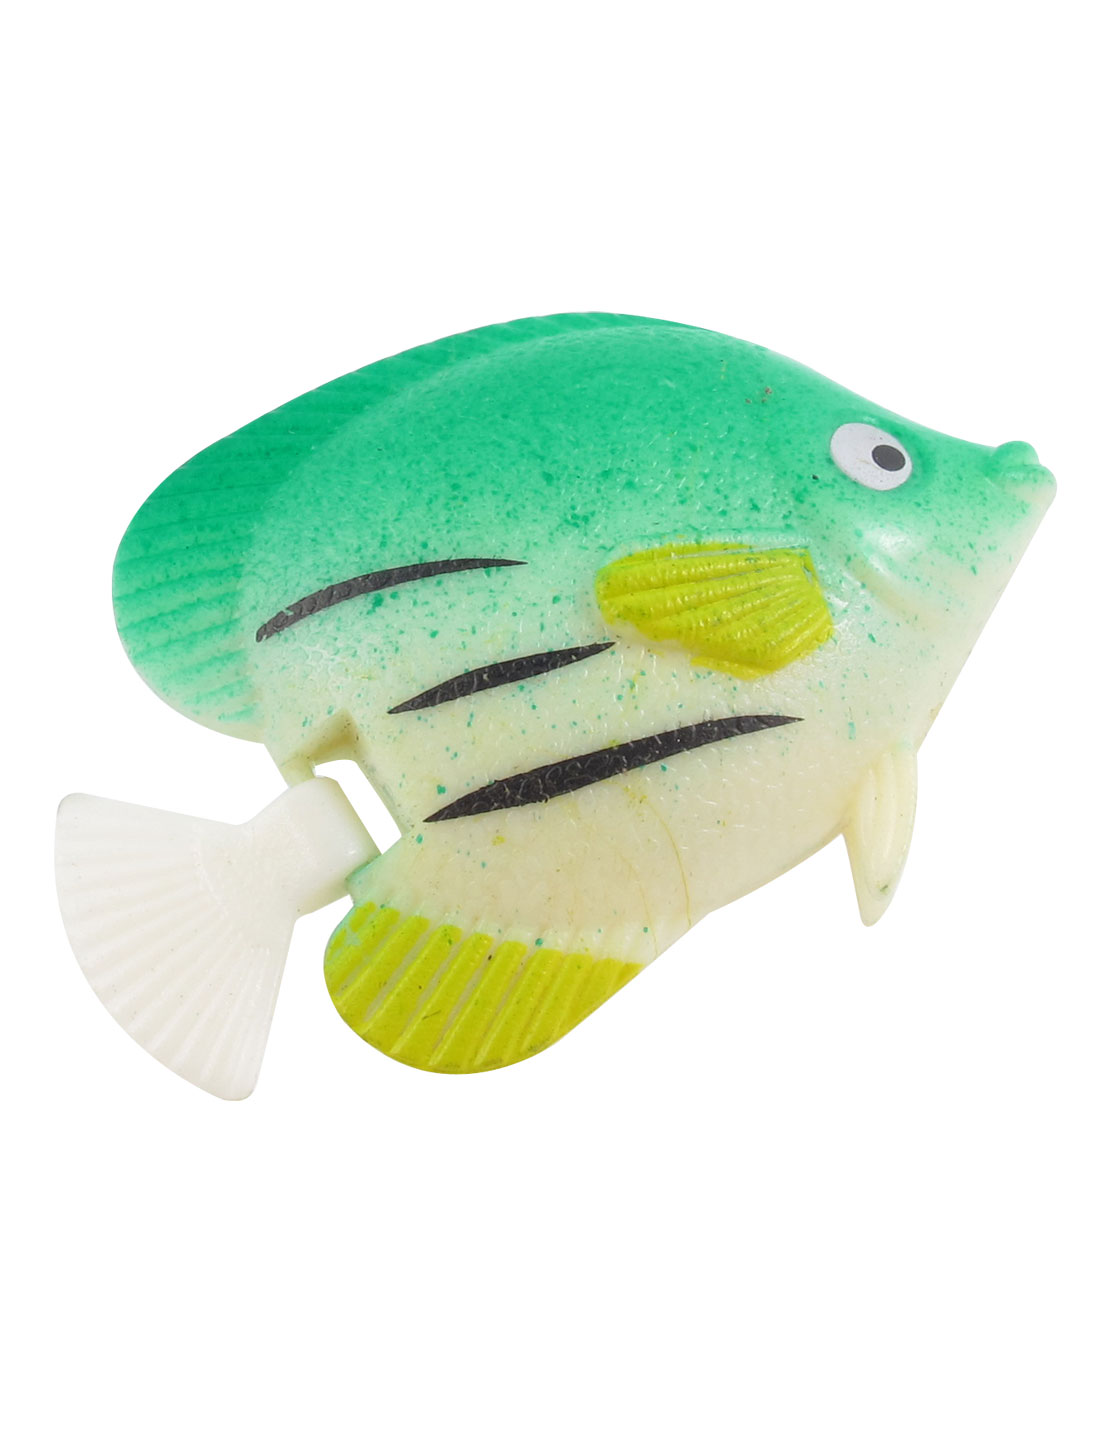 Fake fish tank aquarium walmart - About This Item